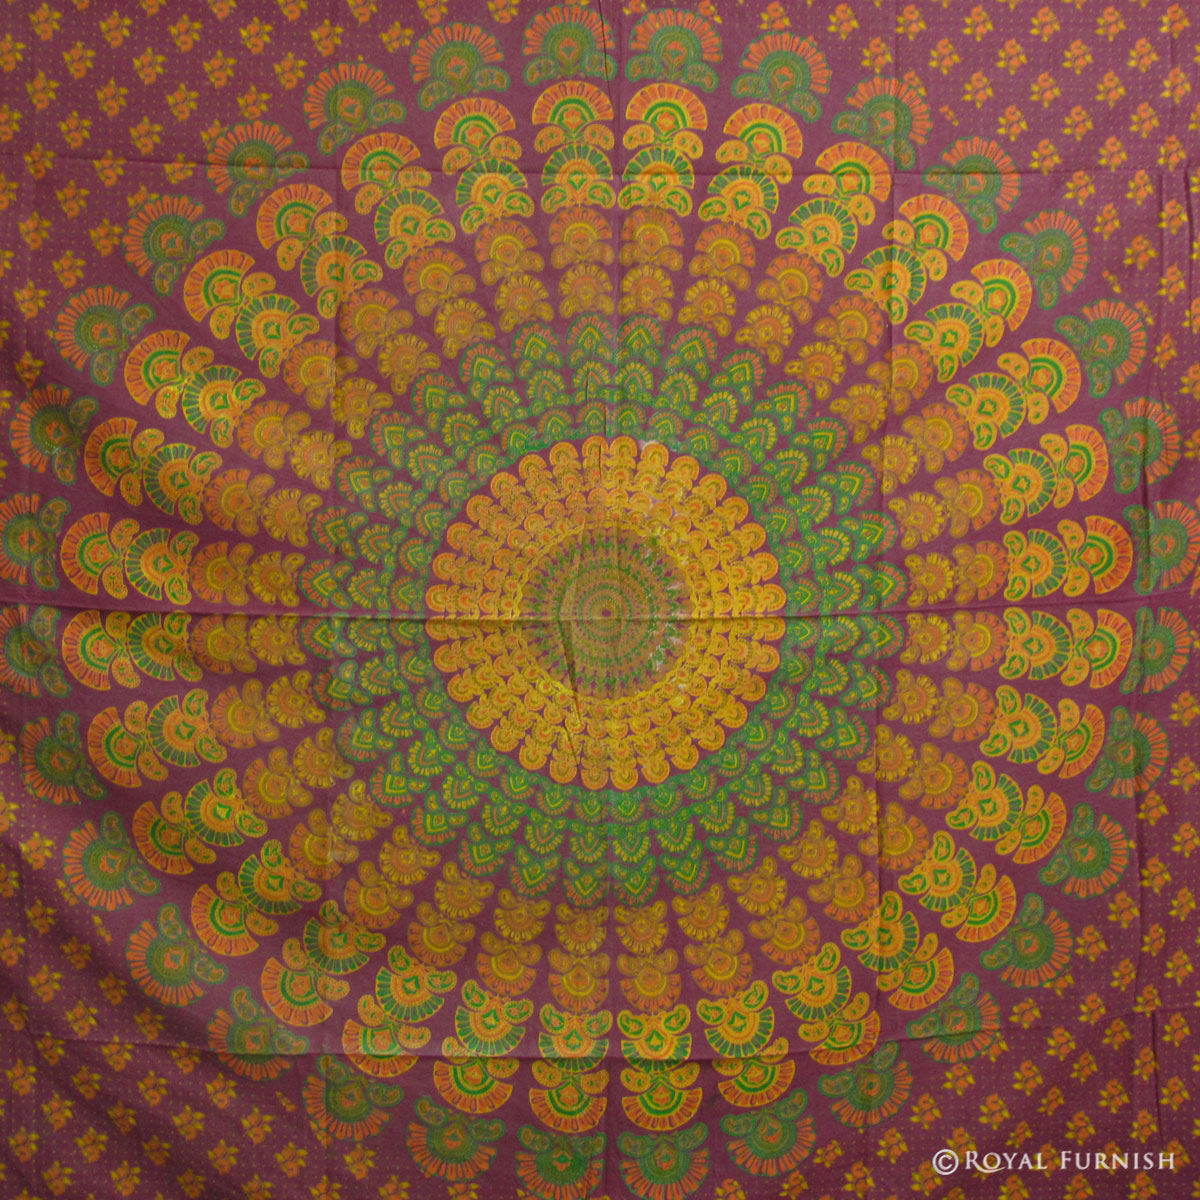 Red Mandala Hippie Bohemian Tapestry Bed Cover - RoyalFurnish.com